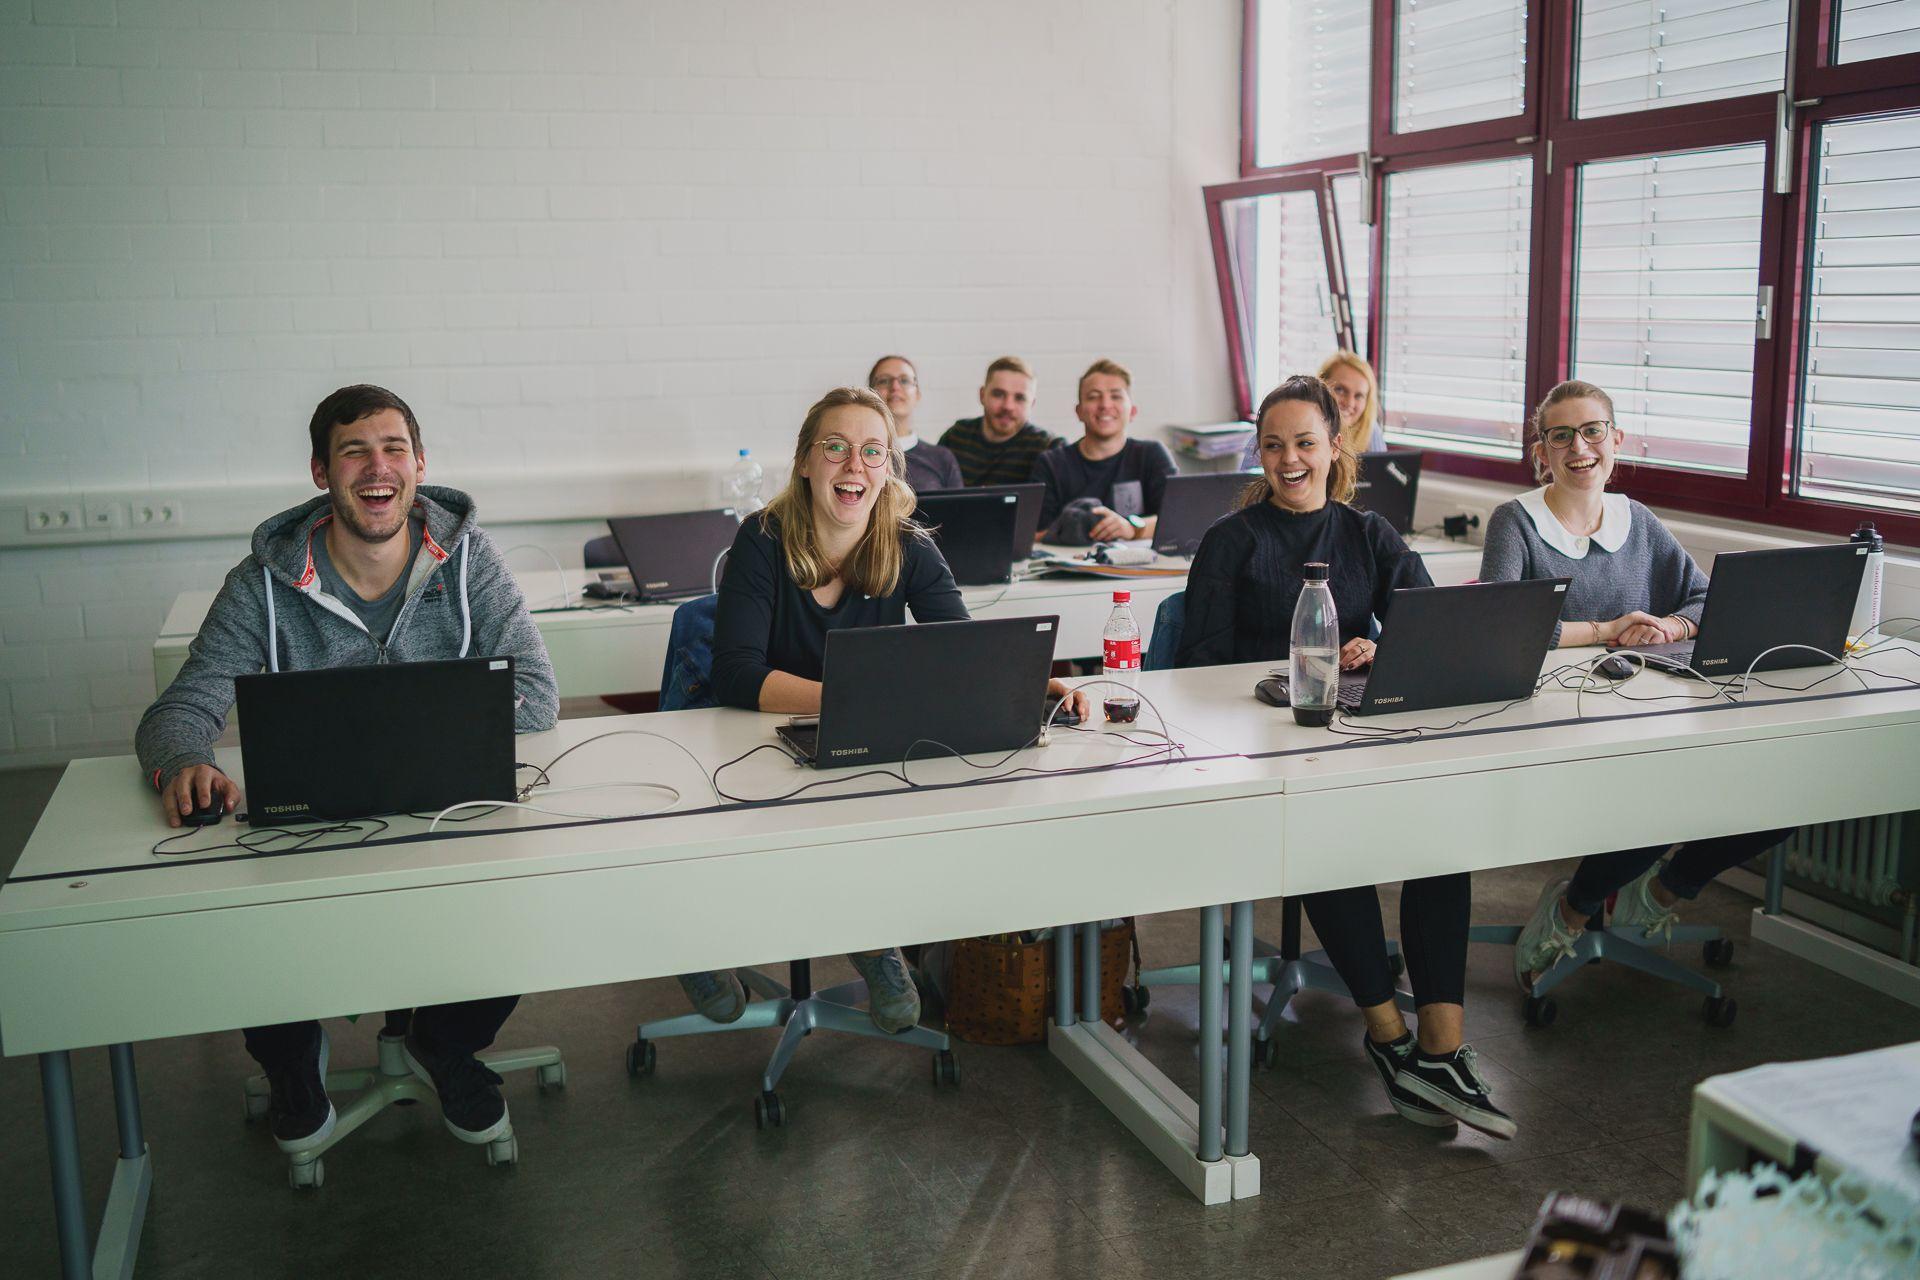 Schüler im eagleControl-Workshop an der Hotelfachschule Heidelberg